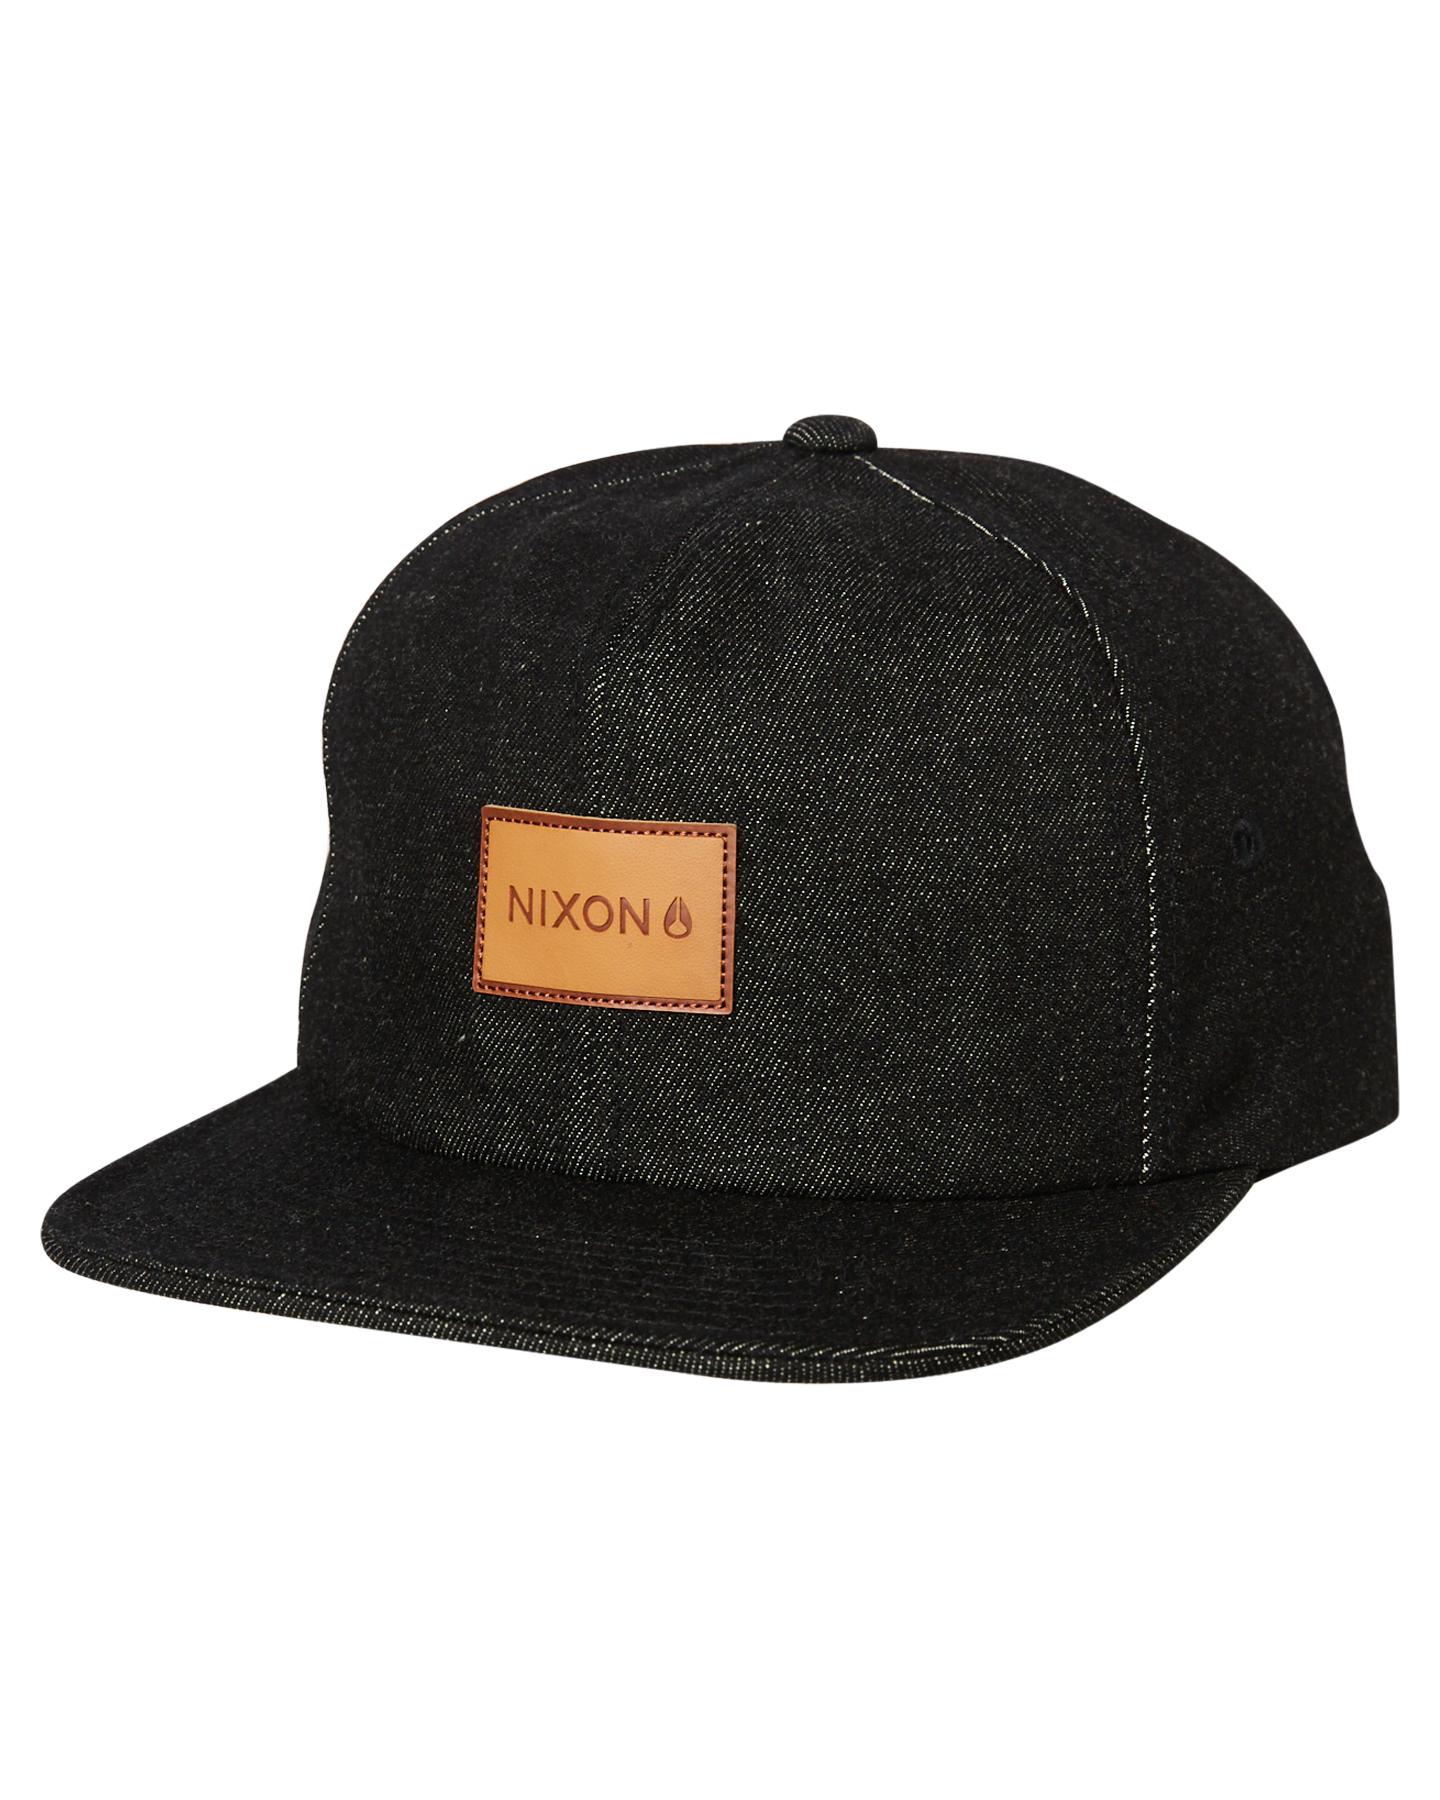 31857ffa2a3ee BLACK MENS ACCESSORIES NIXON HEADWEAR - C2911000 ...